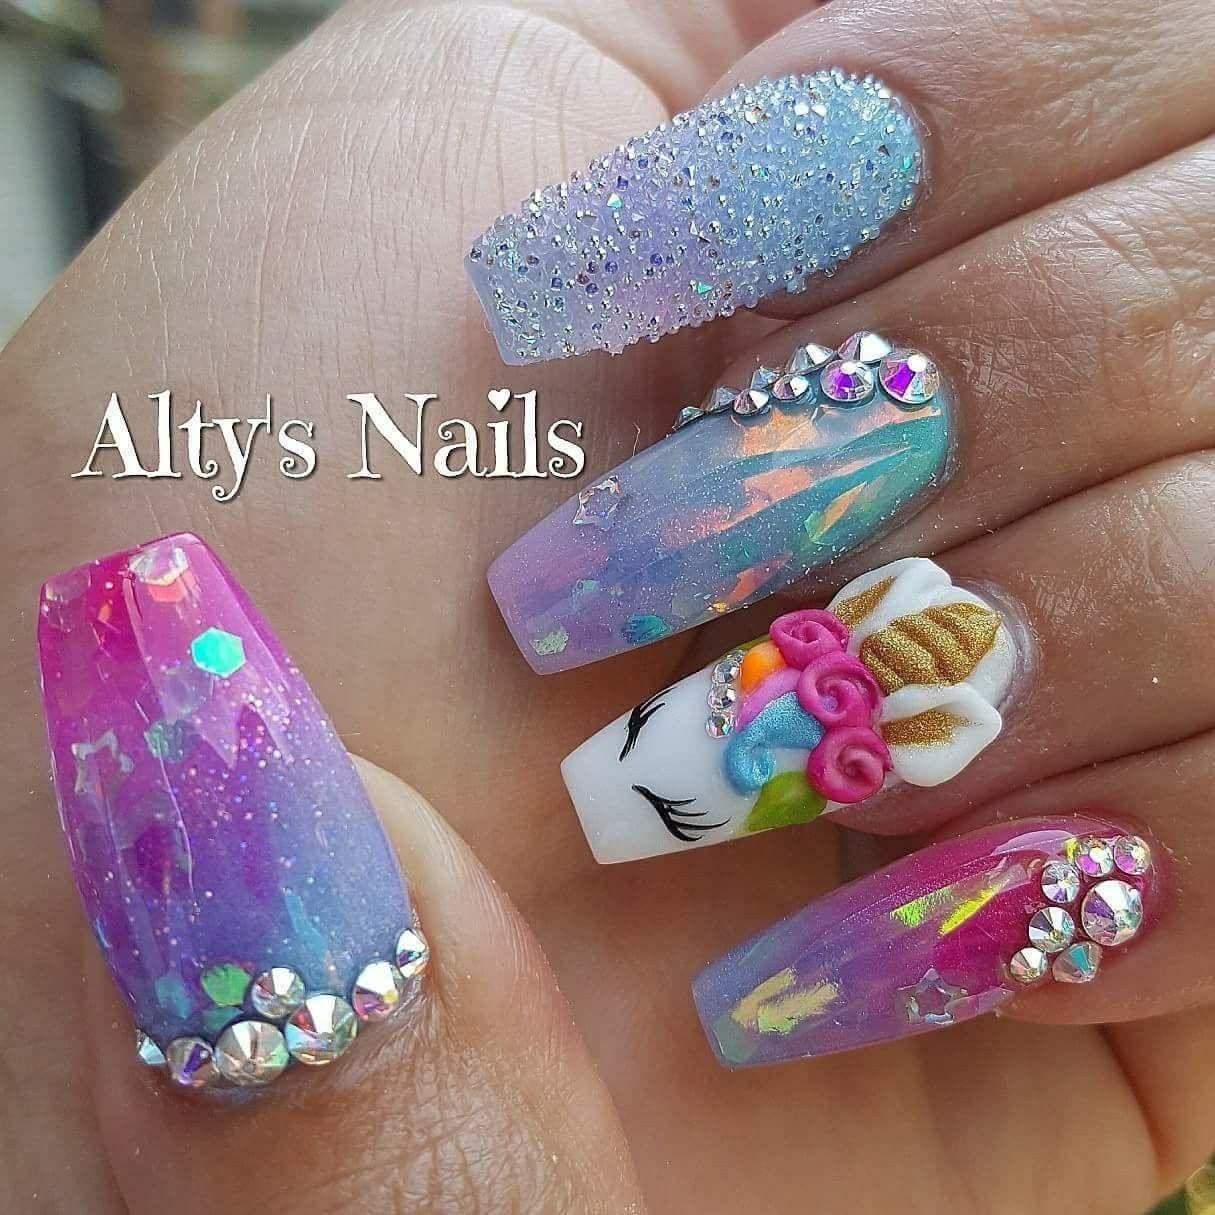 10 Unicorn Nails That Are Truly Magical | Unicorn nails, Unicorns ...